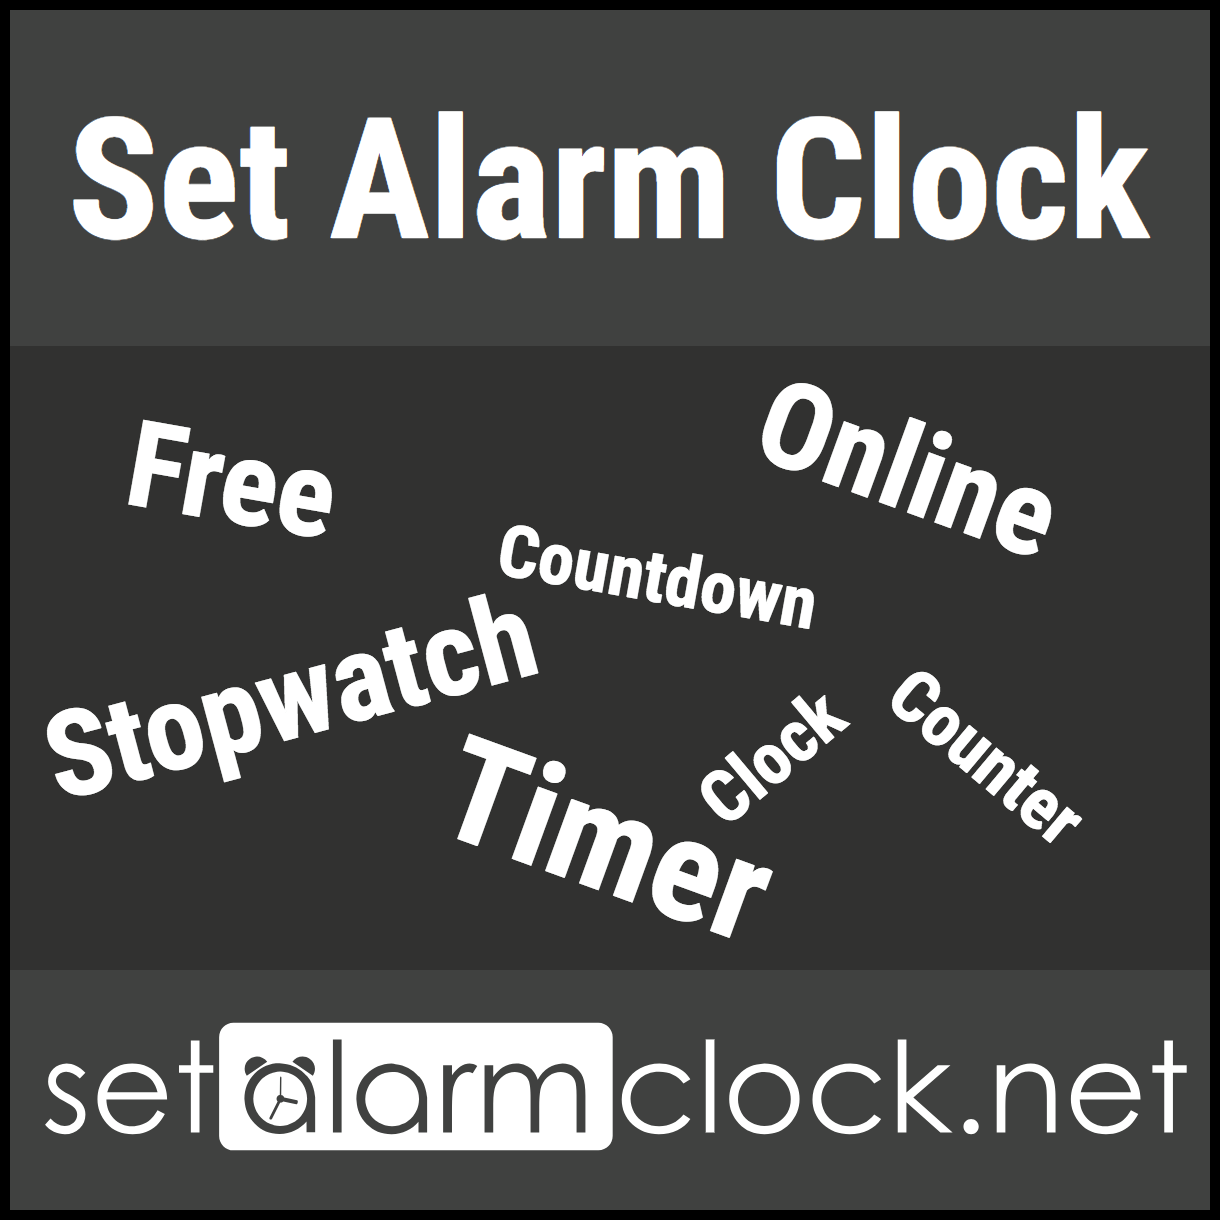 Tool With Online Alarm Clock